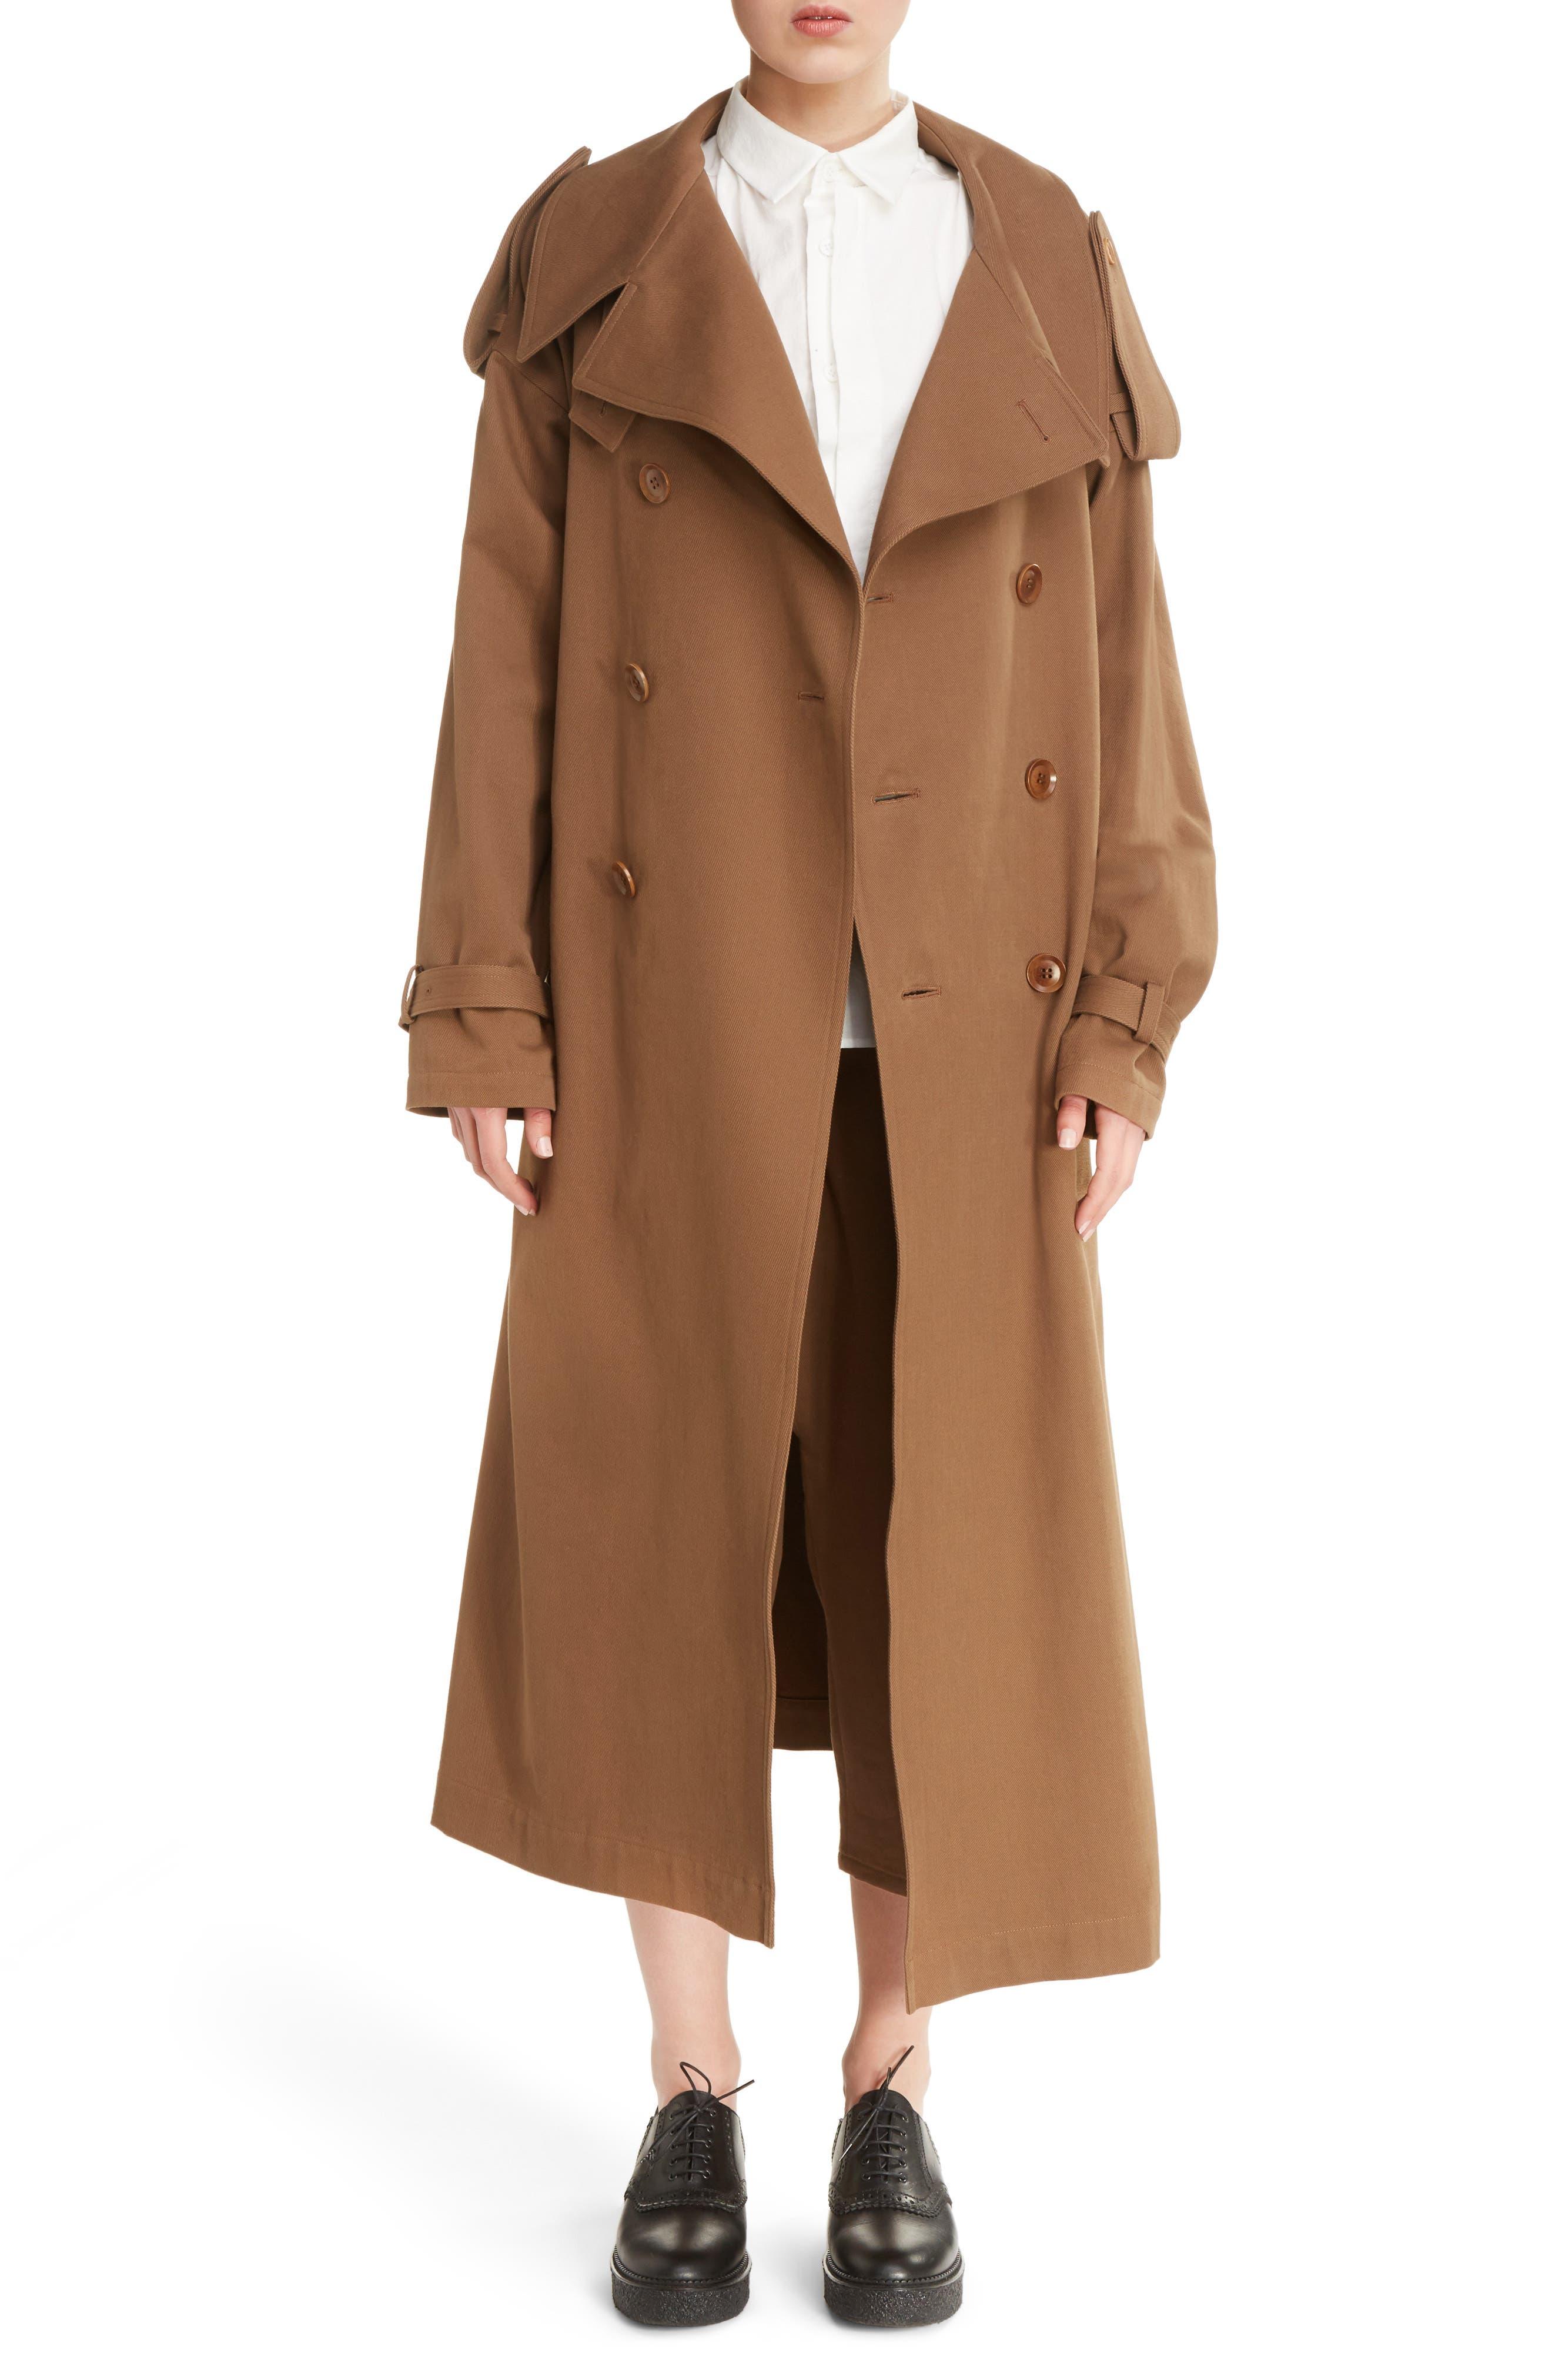 Ys by Yohji Yamamoto U Double Breasted Trench Coat